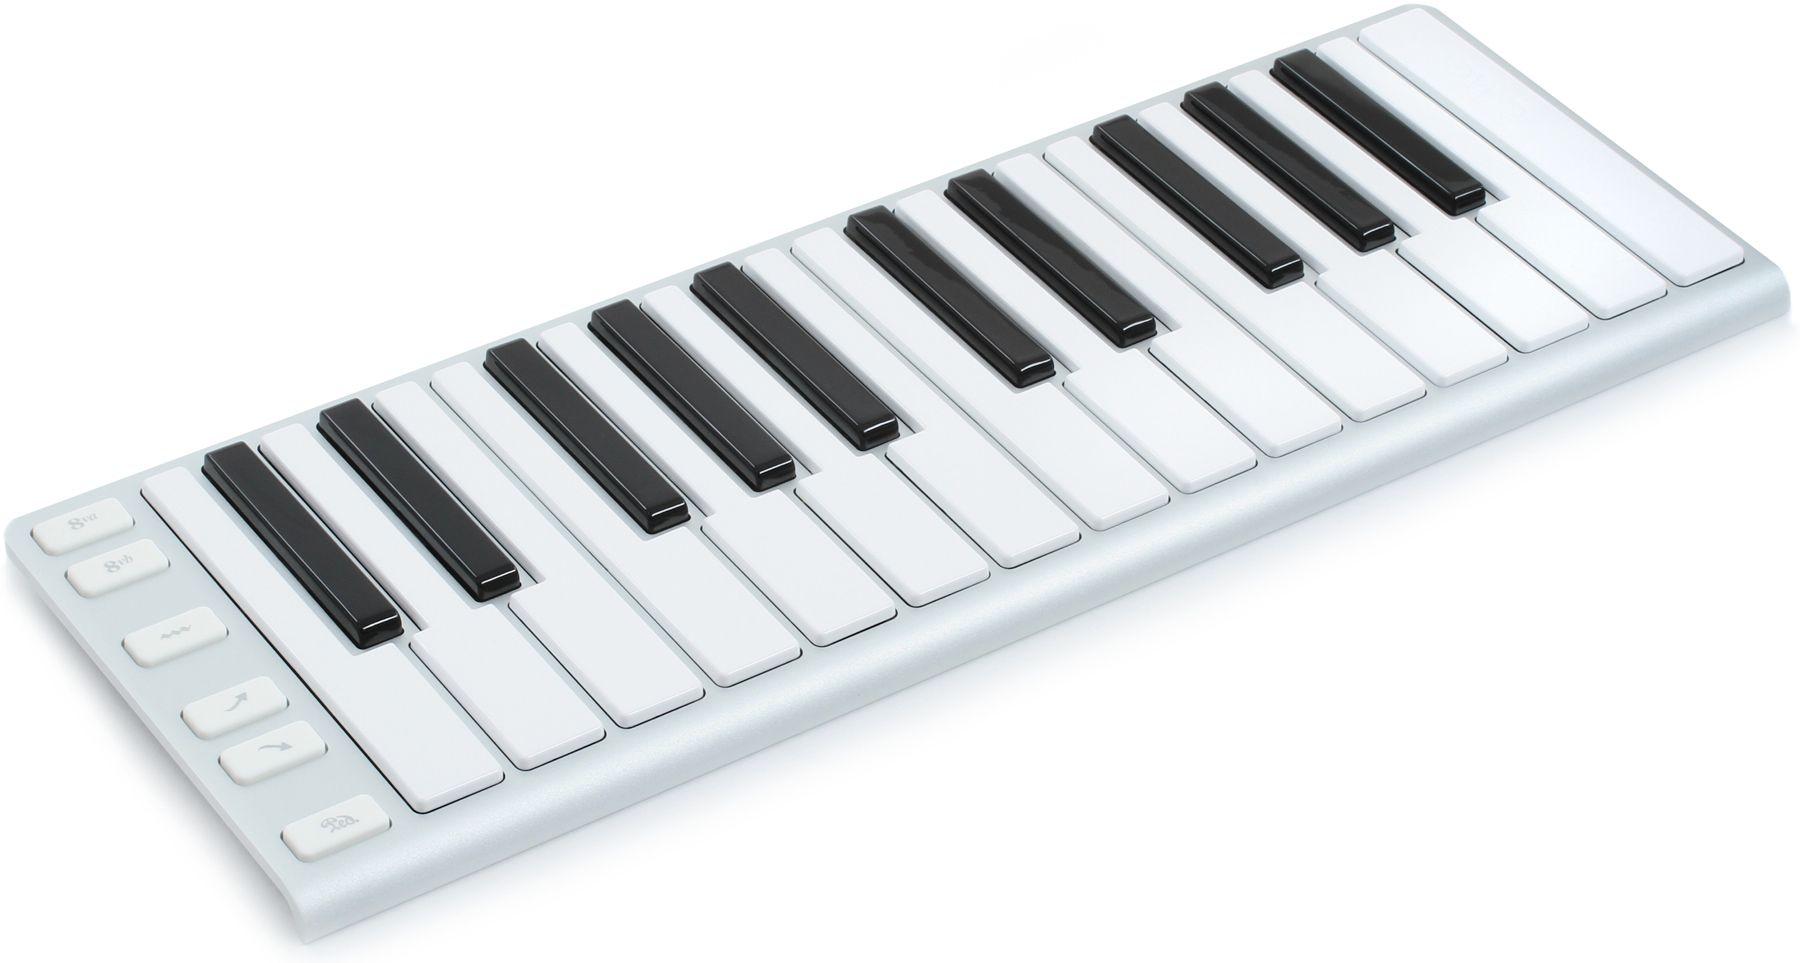 Music Keyboard For Mac